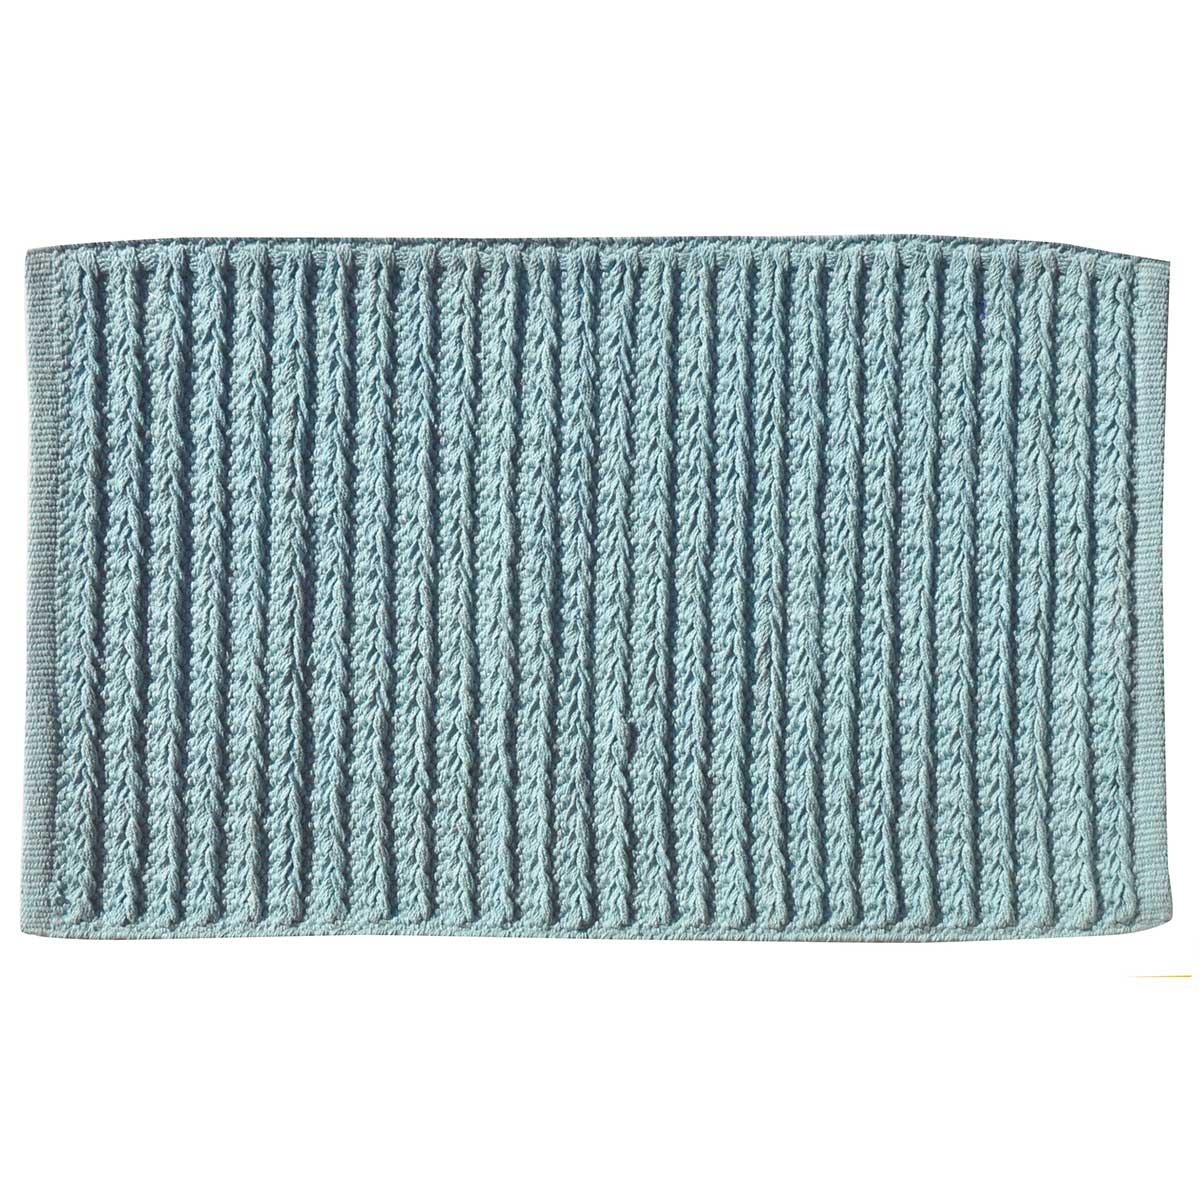 Tapis de bain effet maille (Bleu)